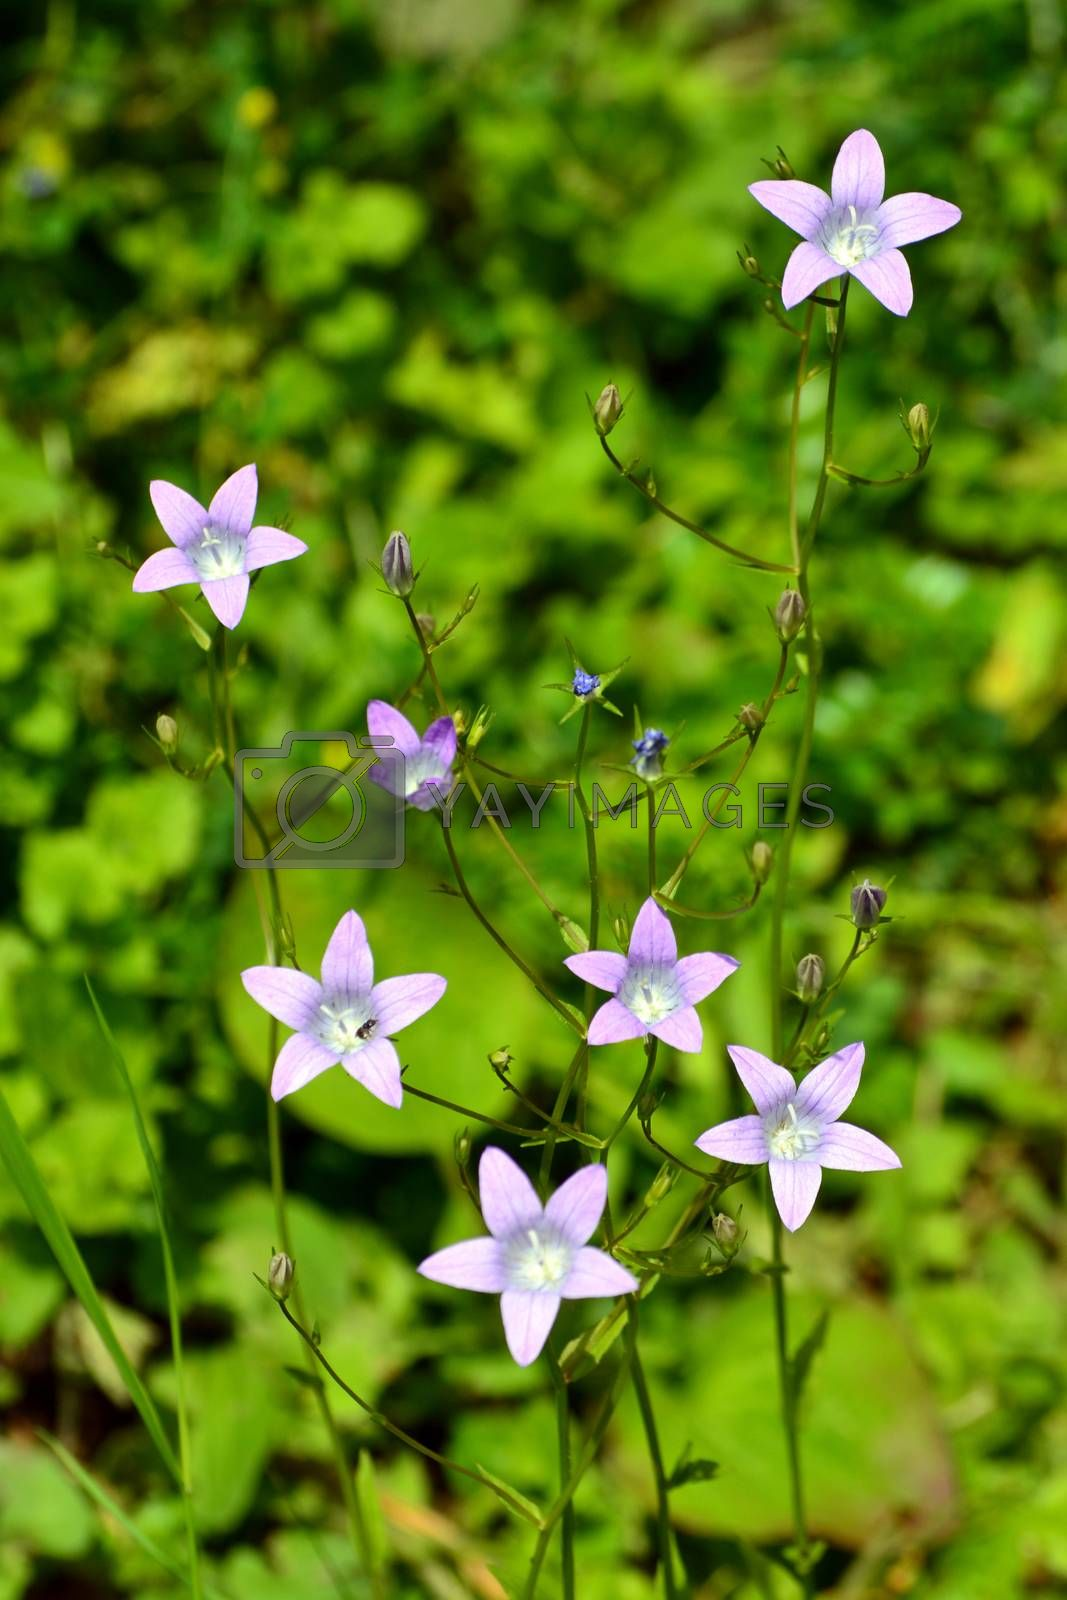 Campanula flowers in bloom on green meadow